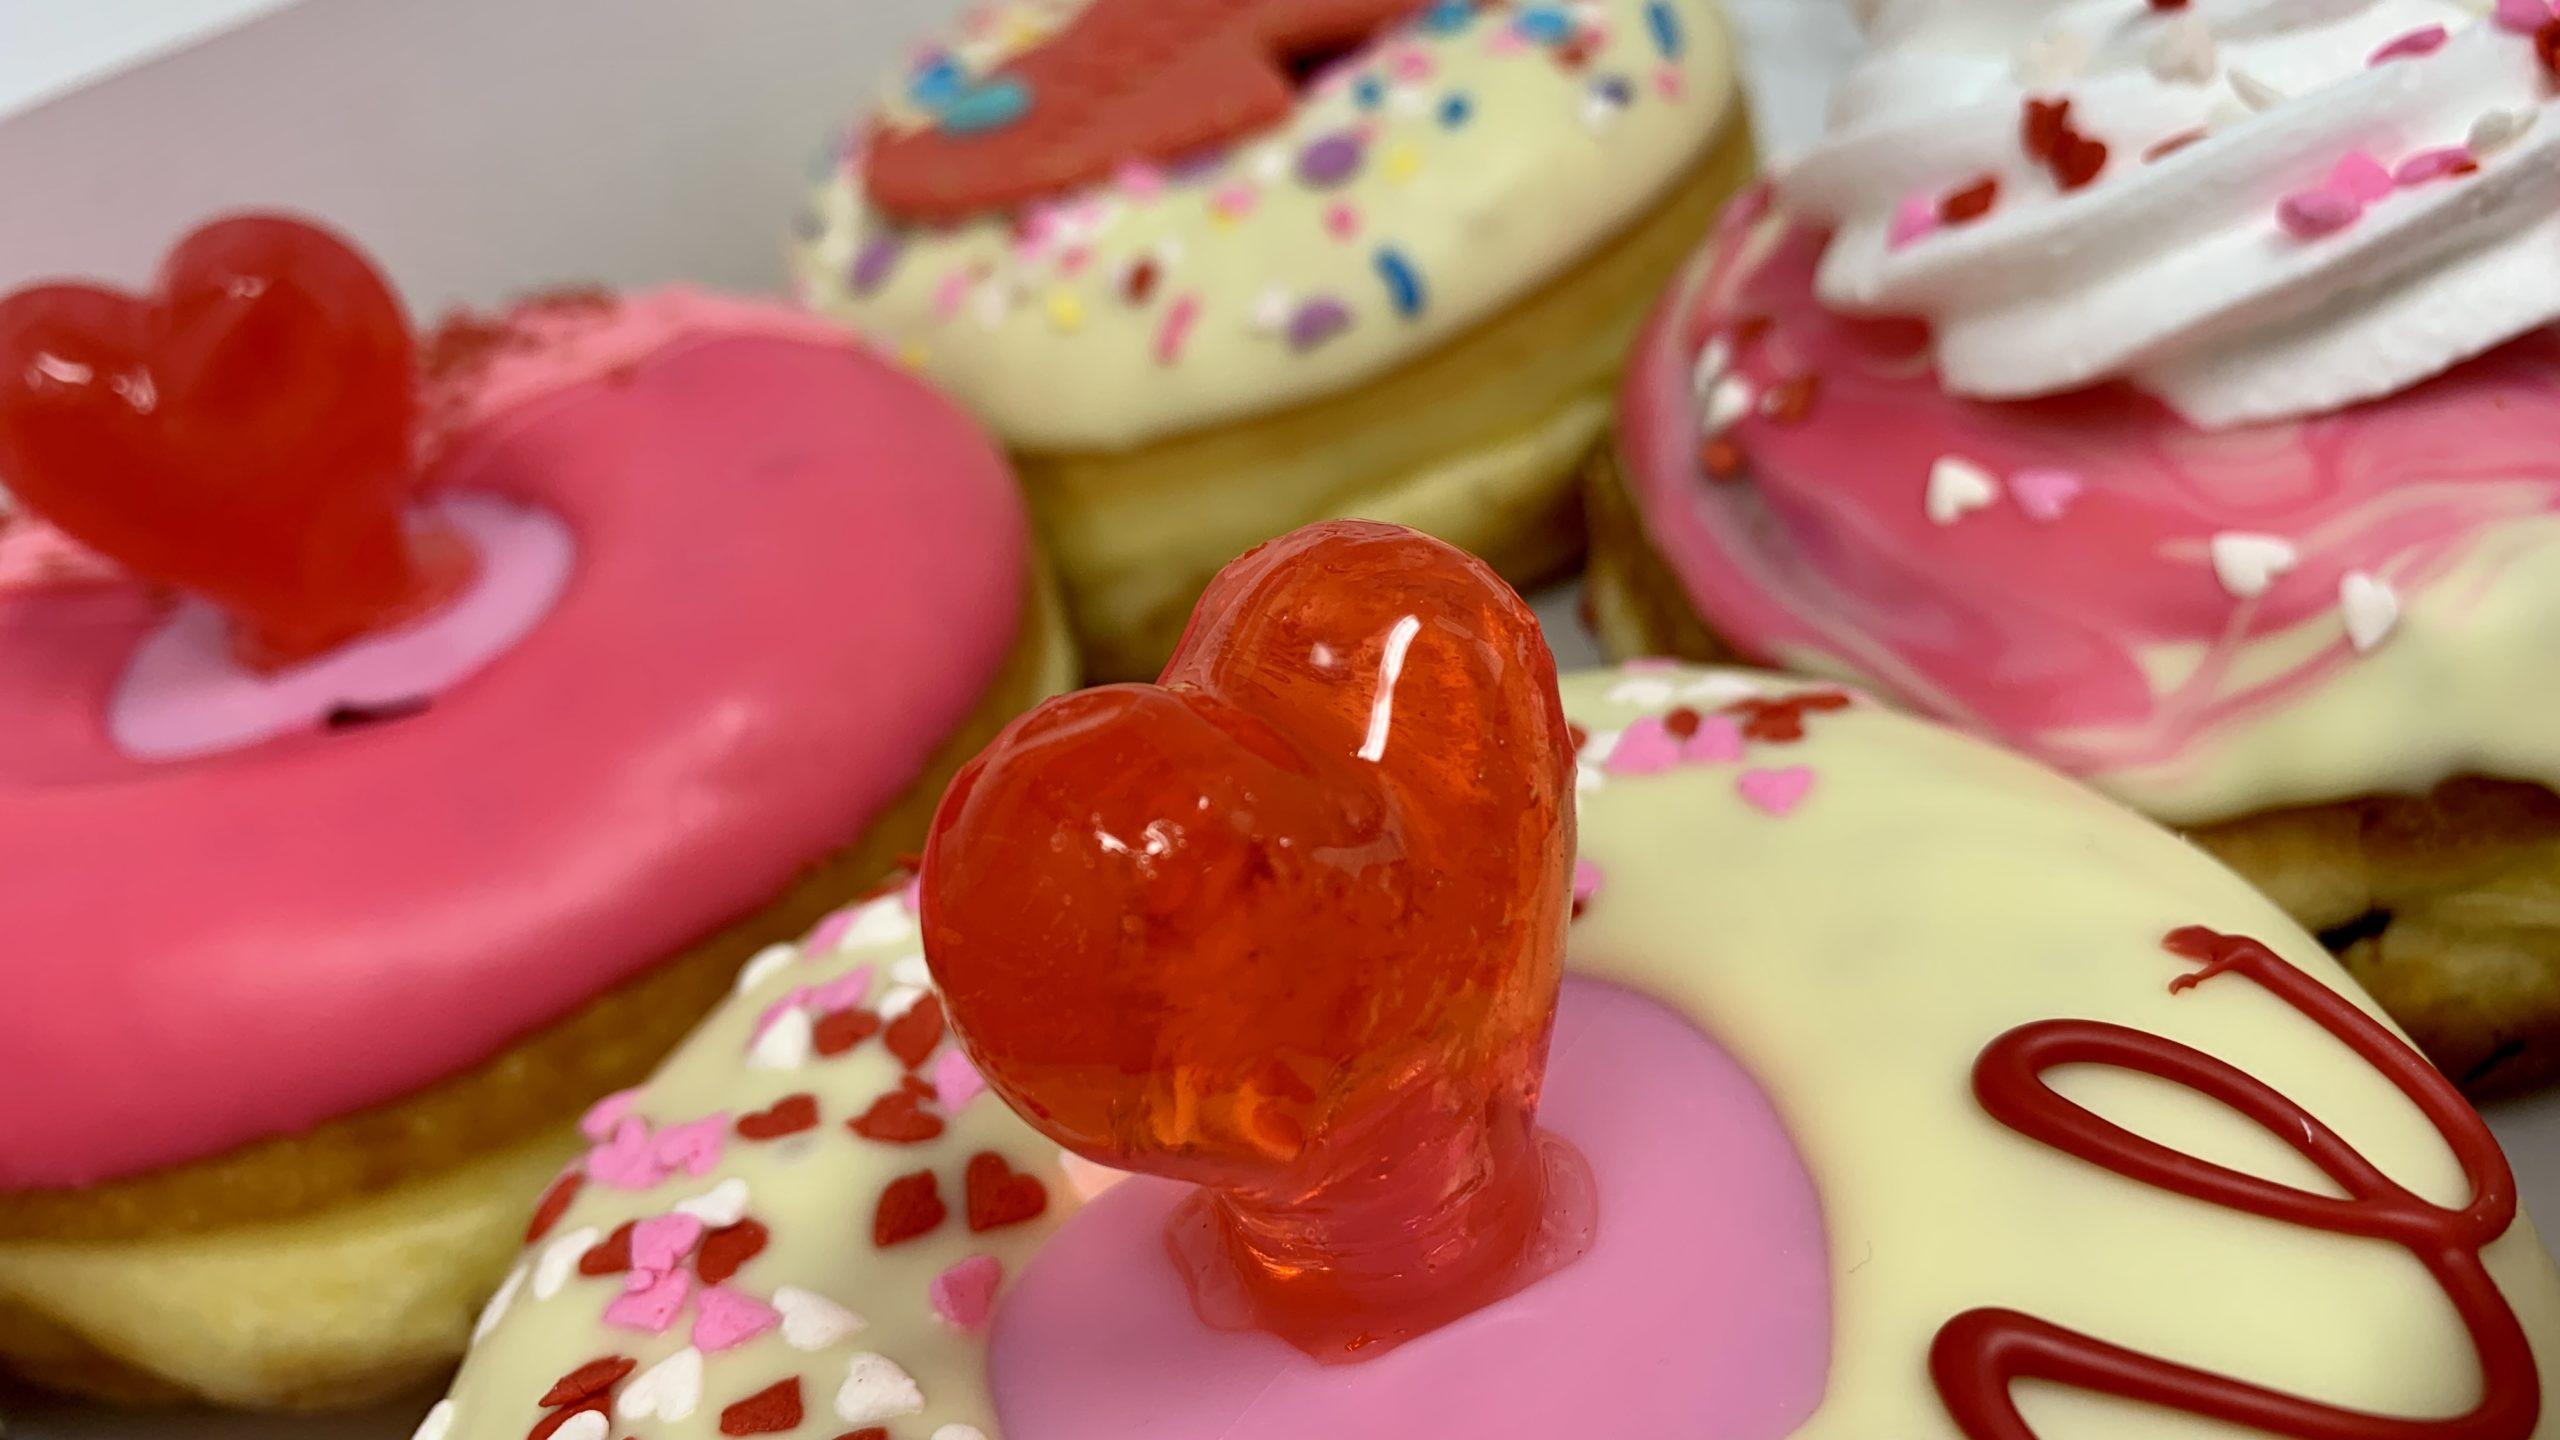 Ring Pop California Donuts Valentine's Day Donut